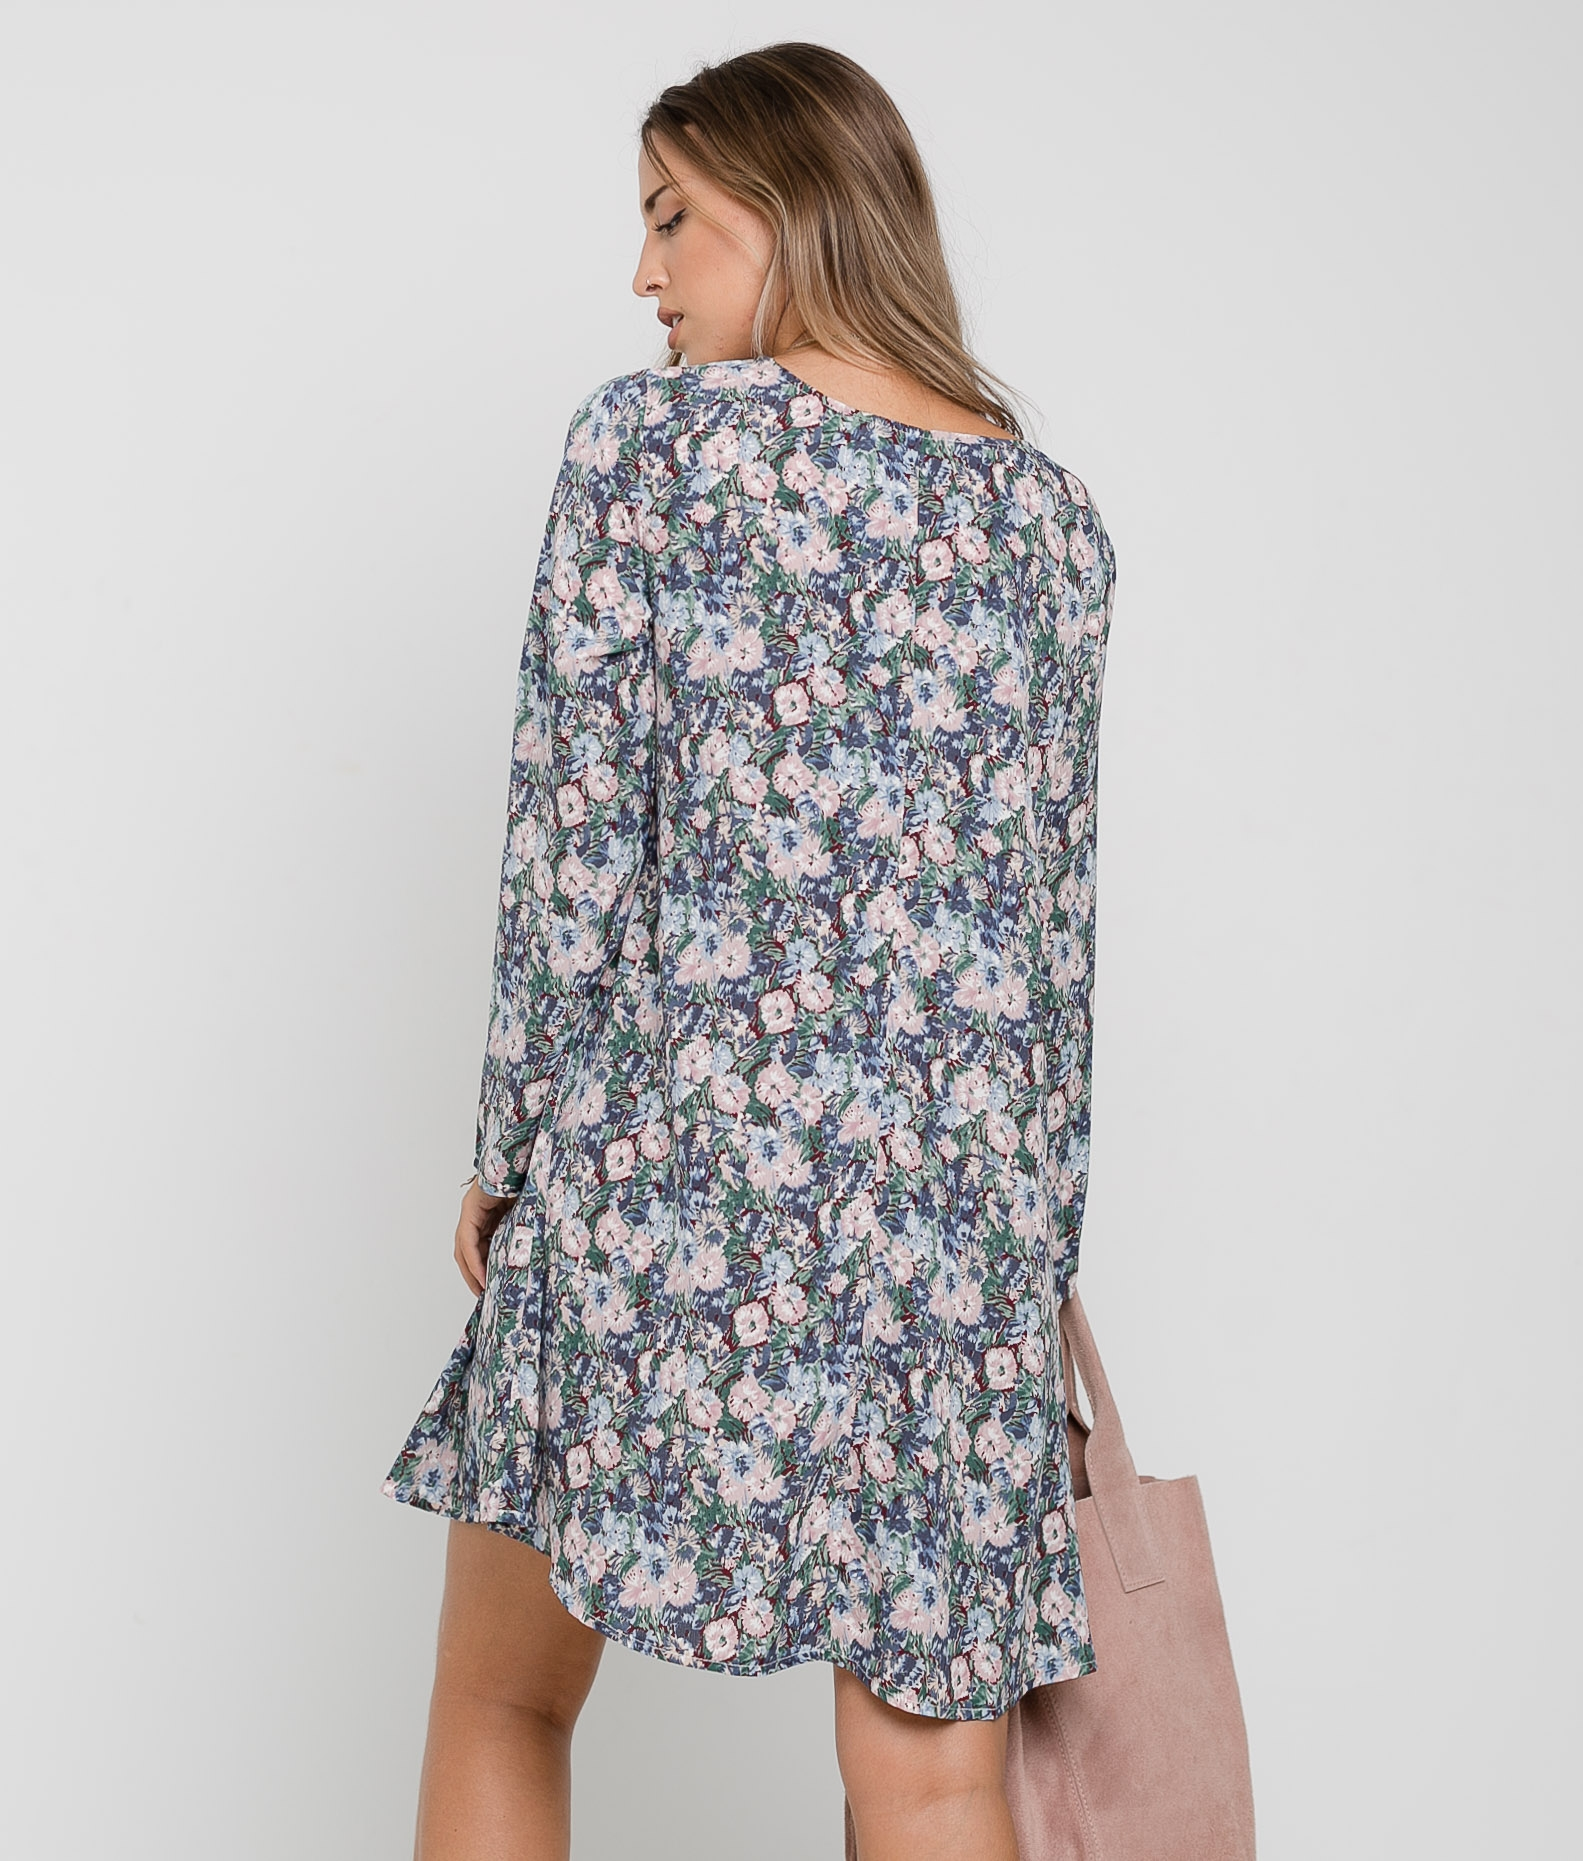 DRESS ODEFI - BLUE